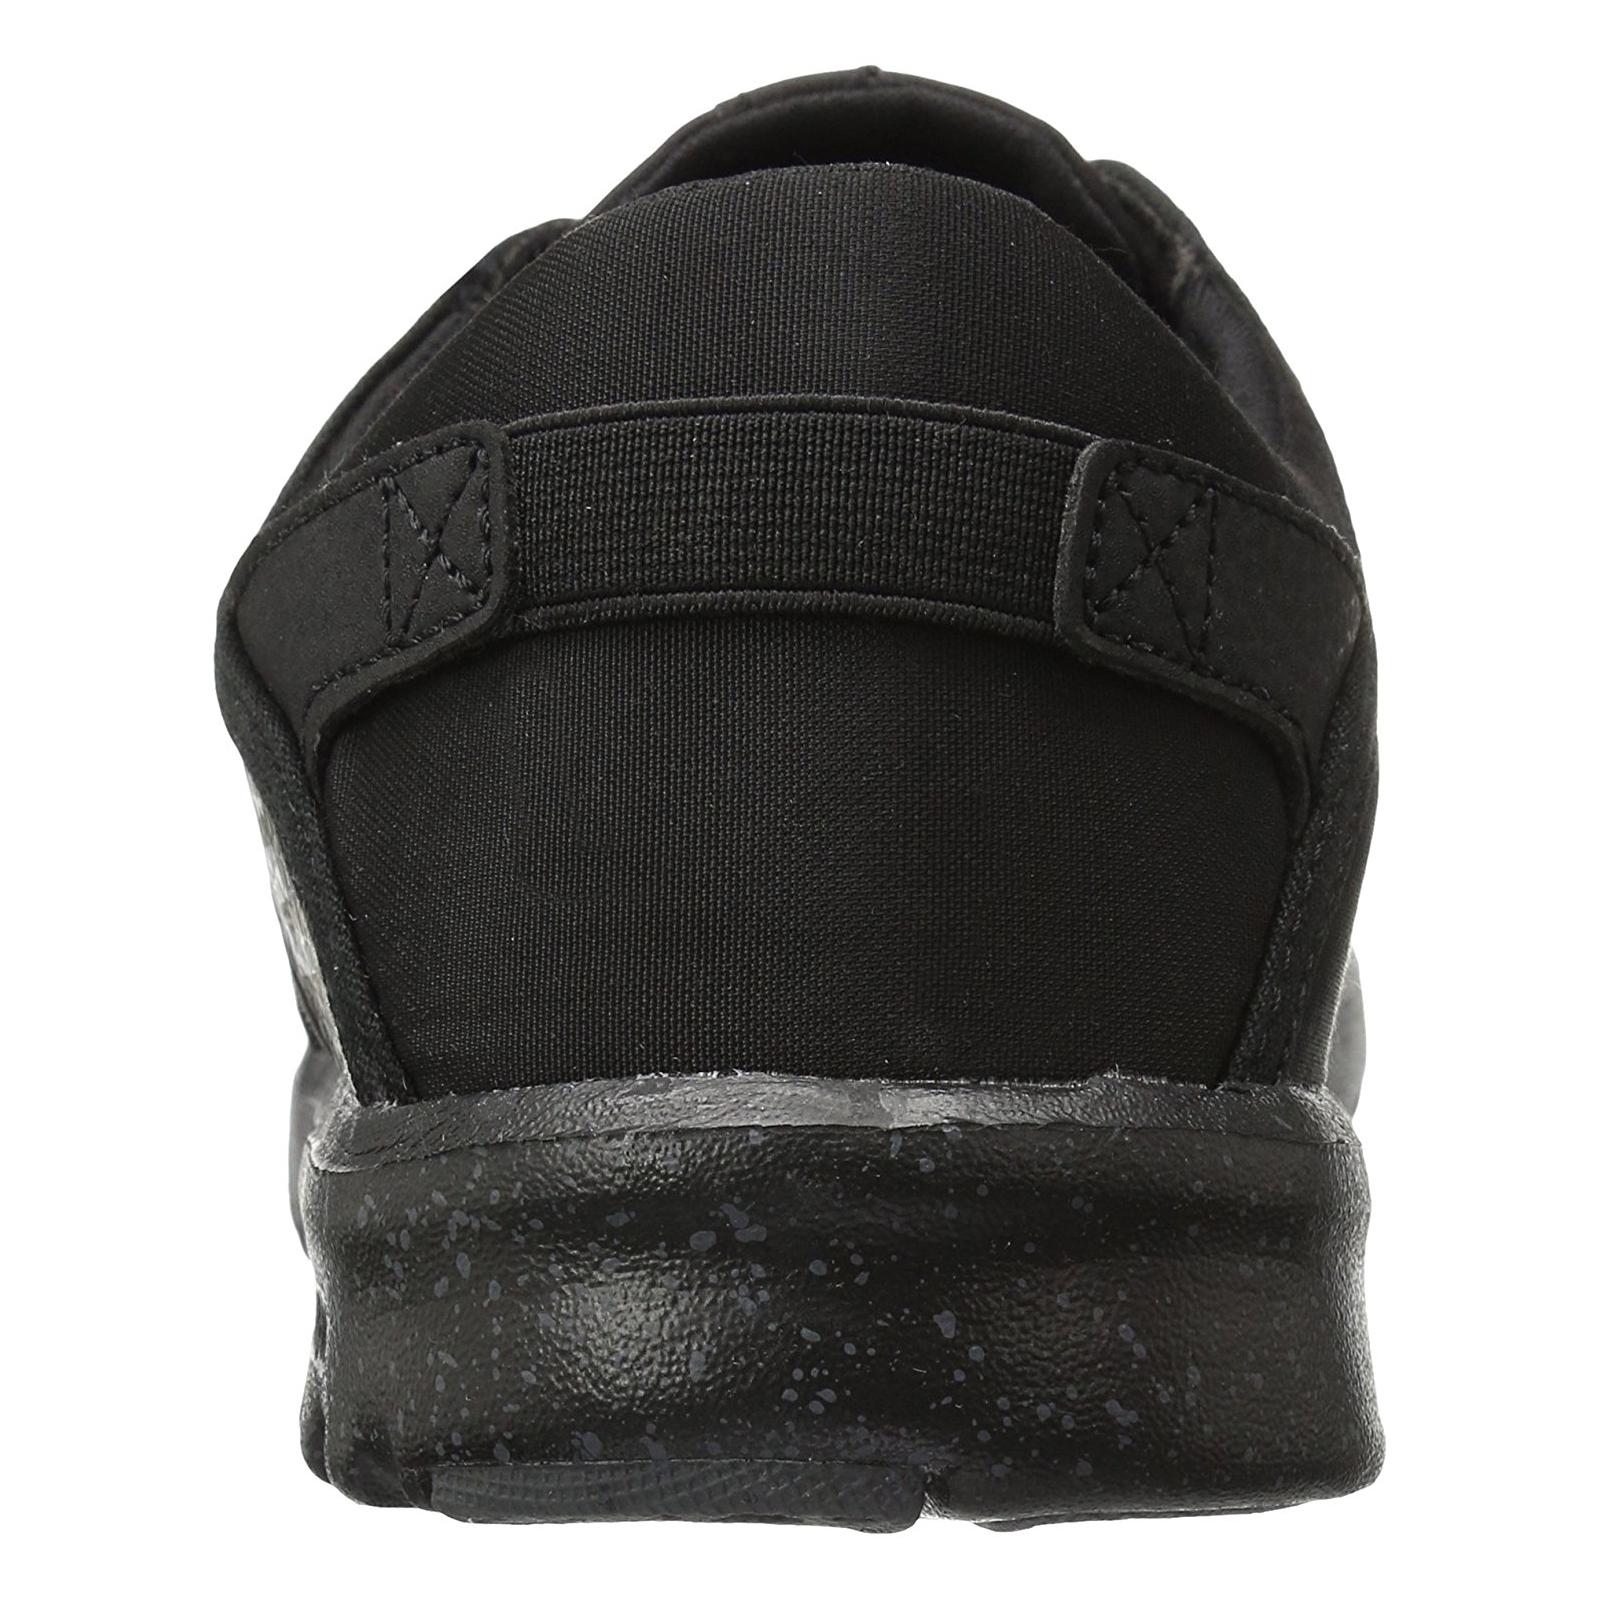 Billig gute Qualität scout Etnies Turnschuhe scout Qualität schwarz/charcoal schwarz d175d3